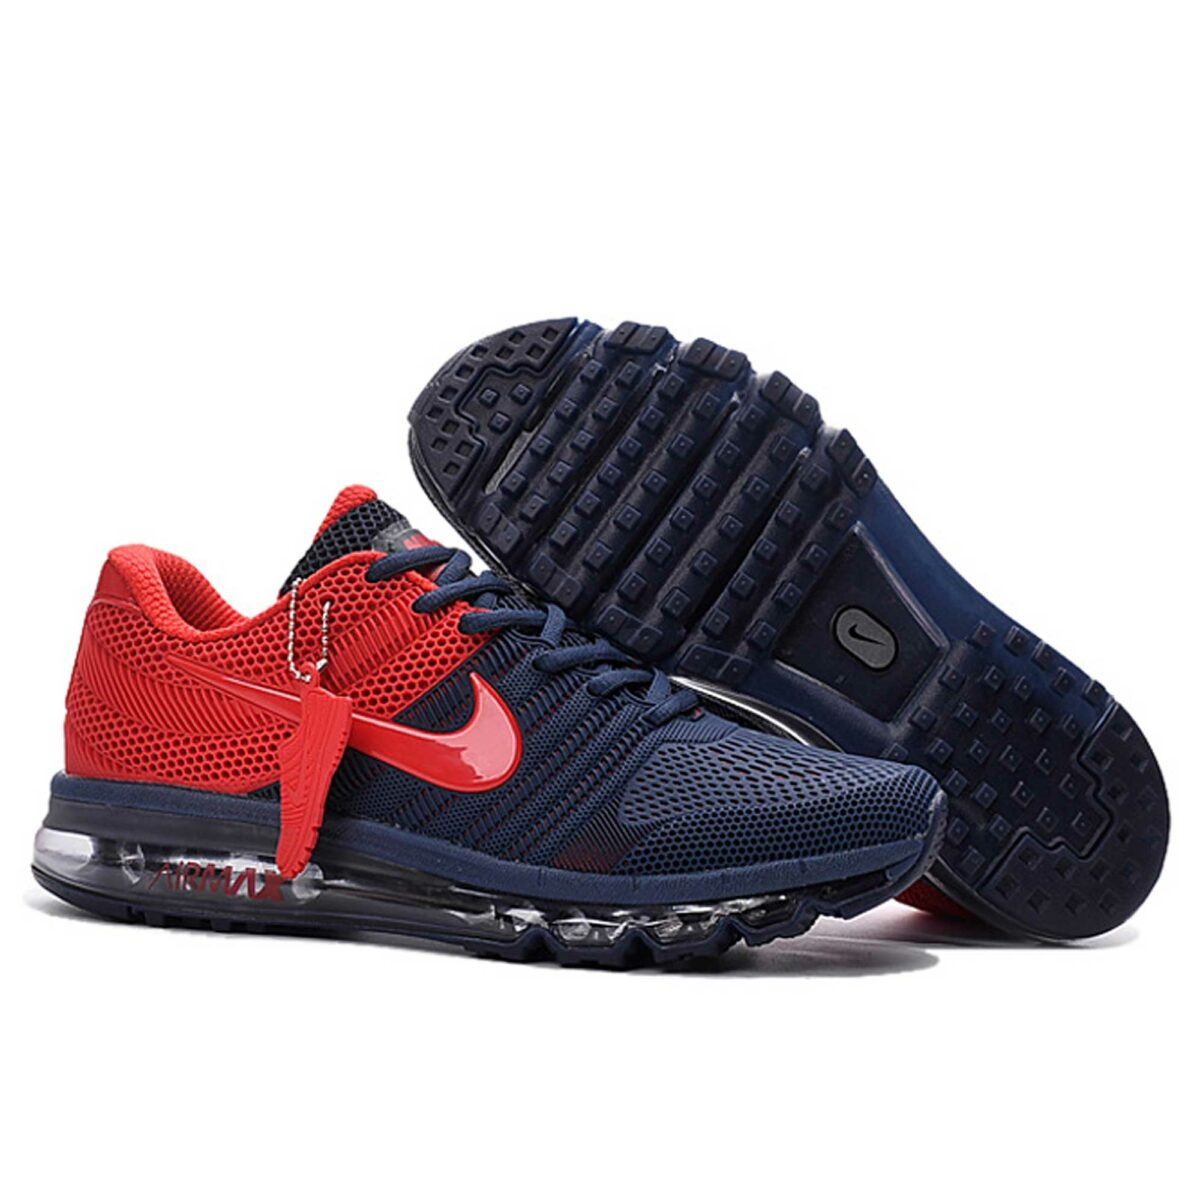 nike air max 2017 KPU dark blue red купить